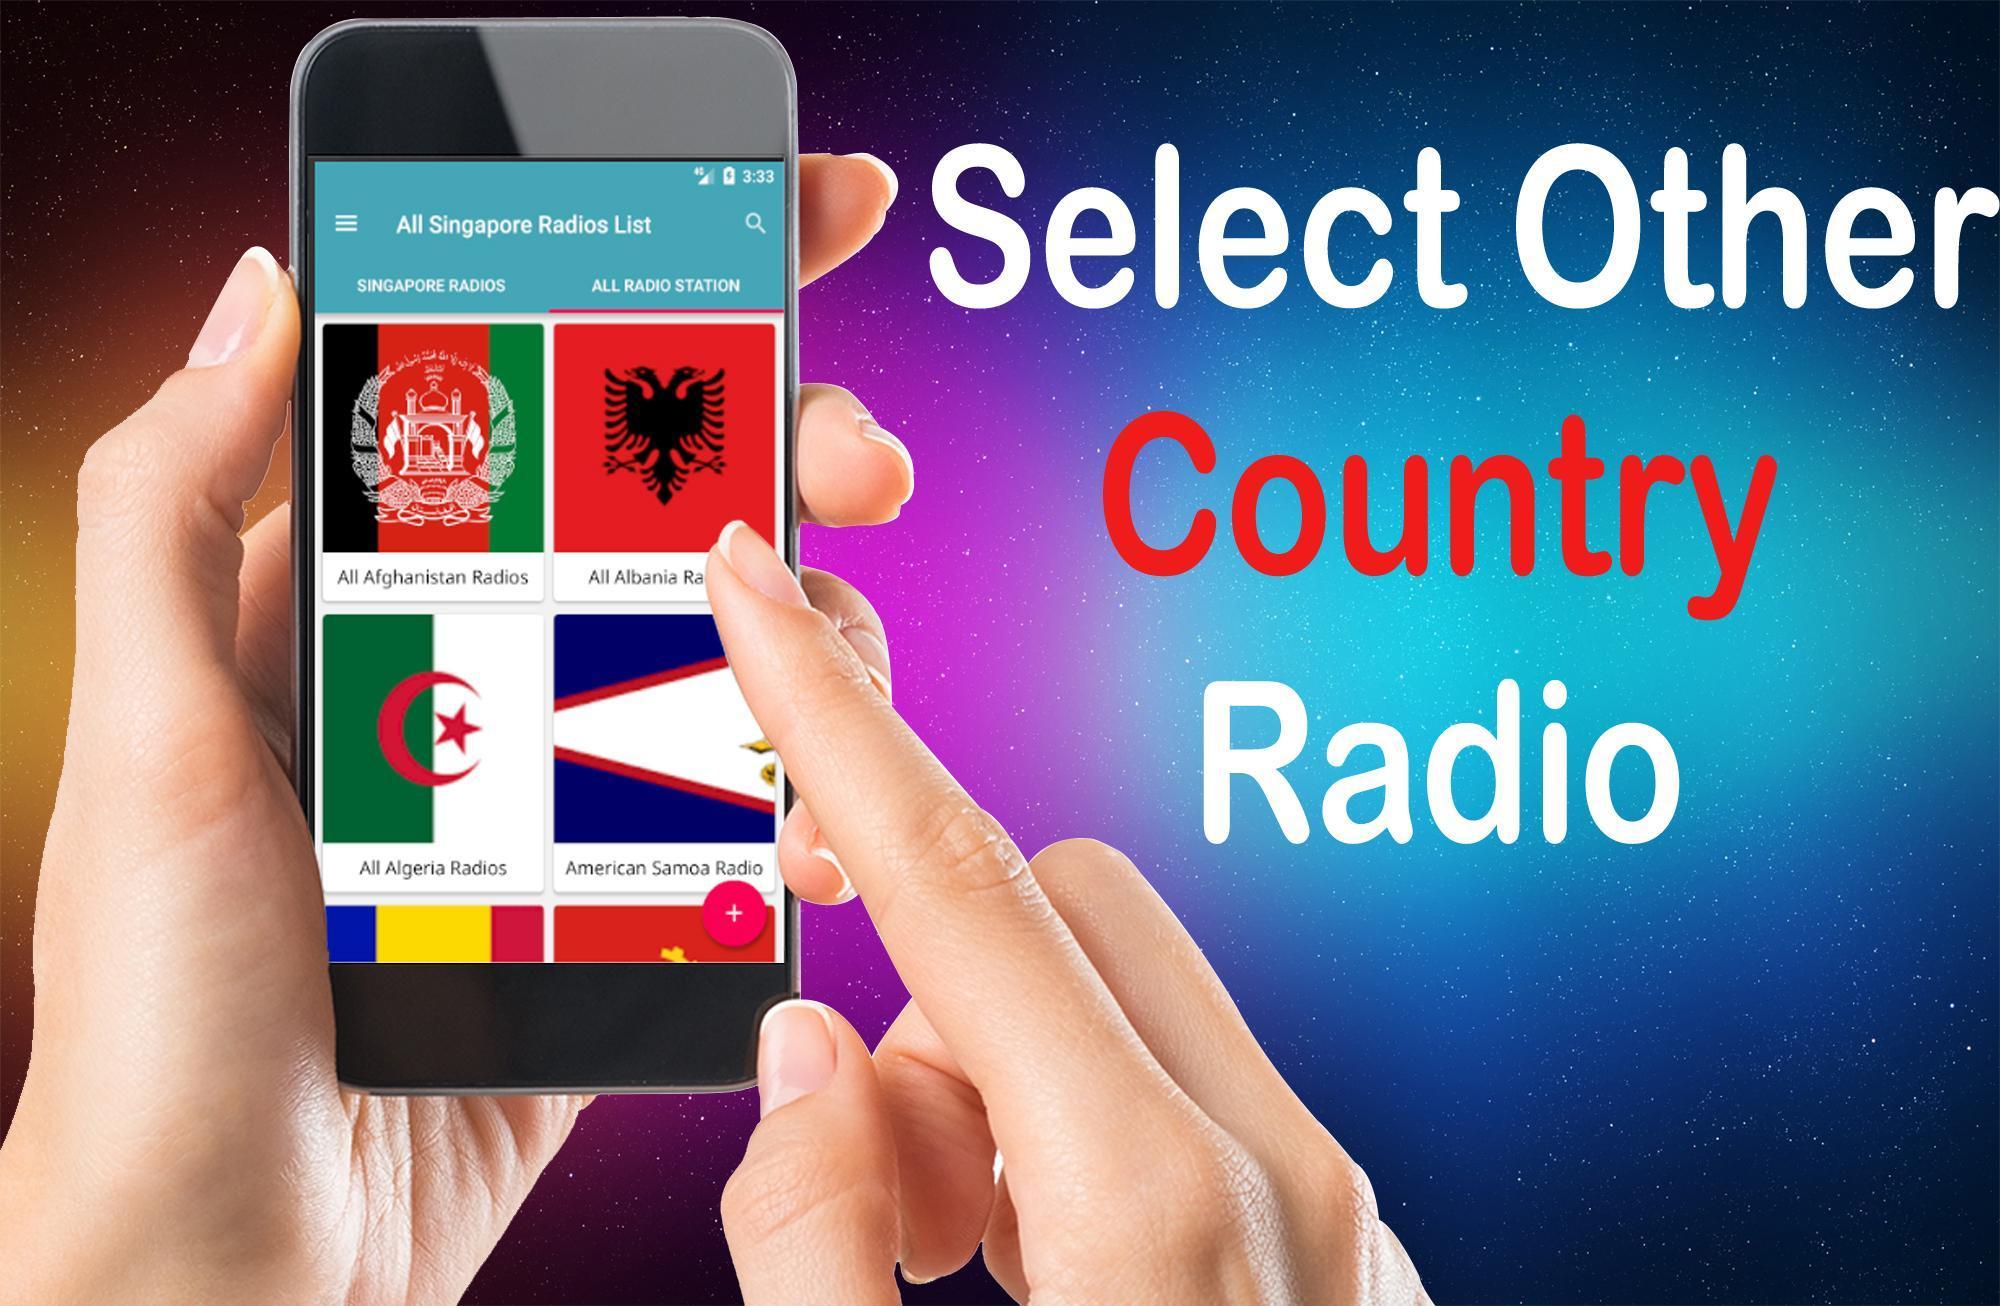 Radio Singapore – All Singapore Radio - SGP Radios for